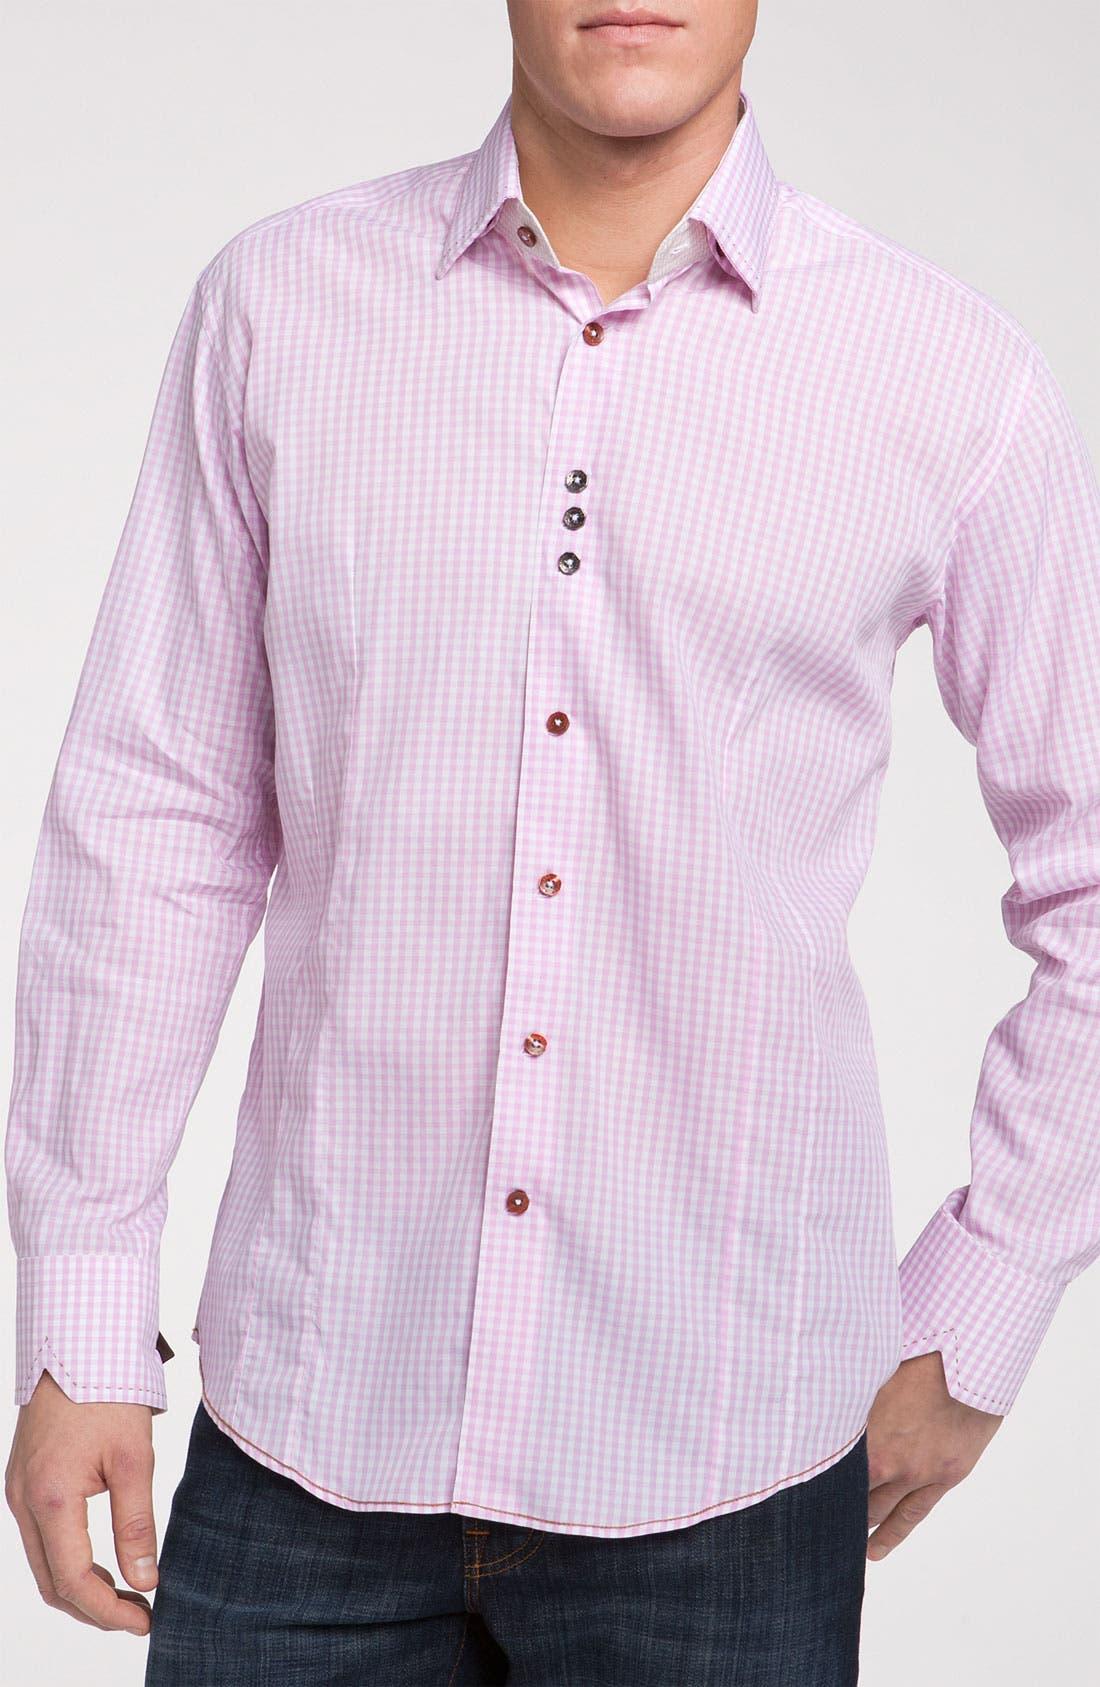 Alternate Image 1 Selected - Bogosse 'JB 46' Sport Shirt